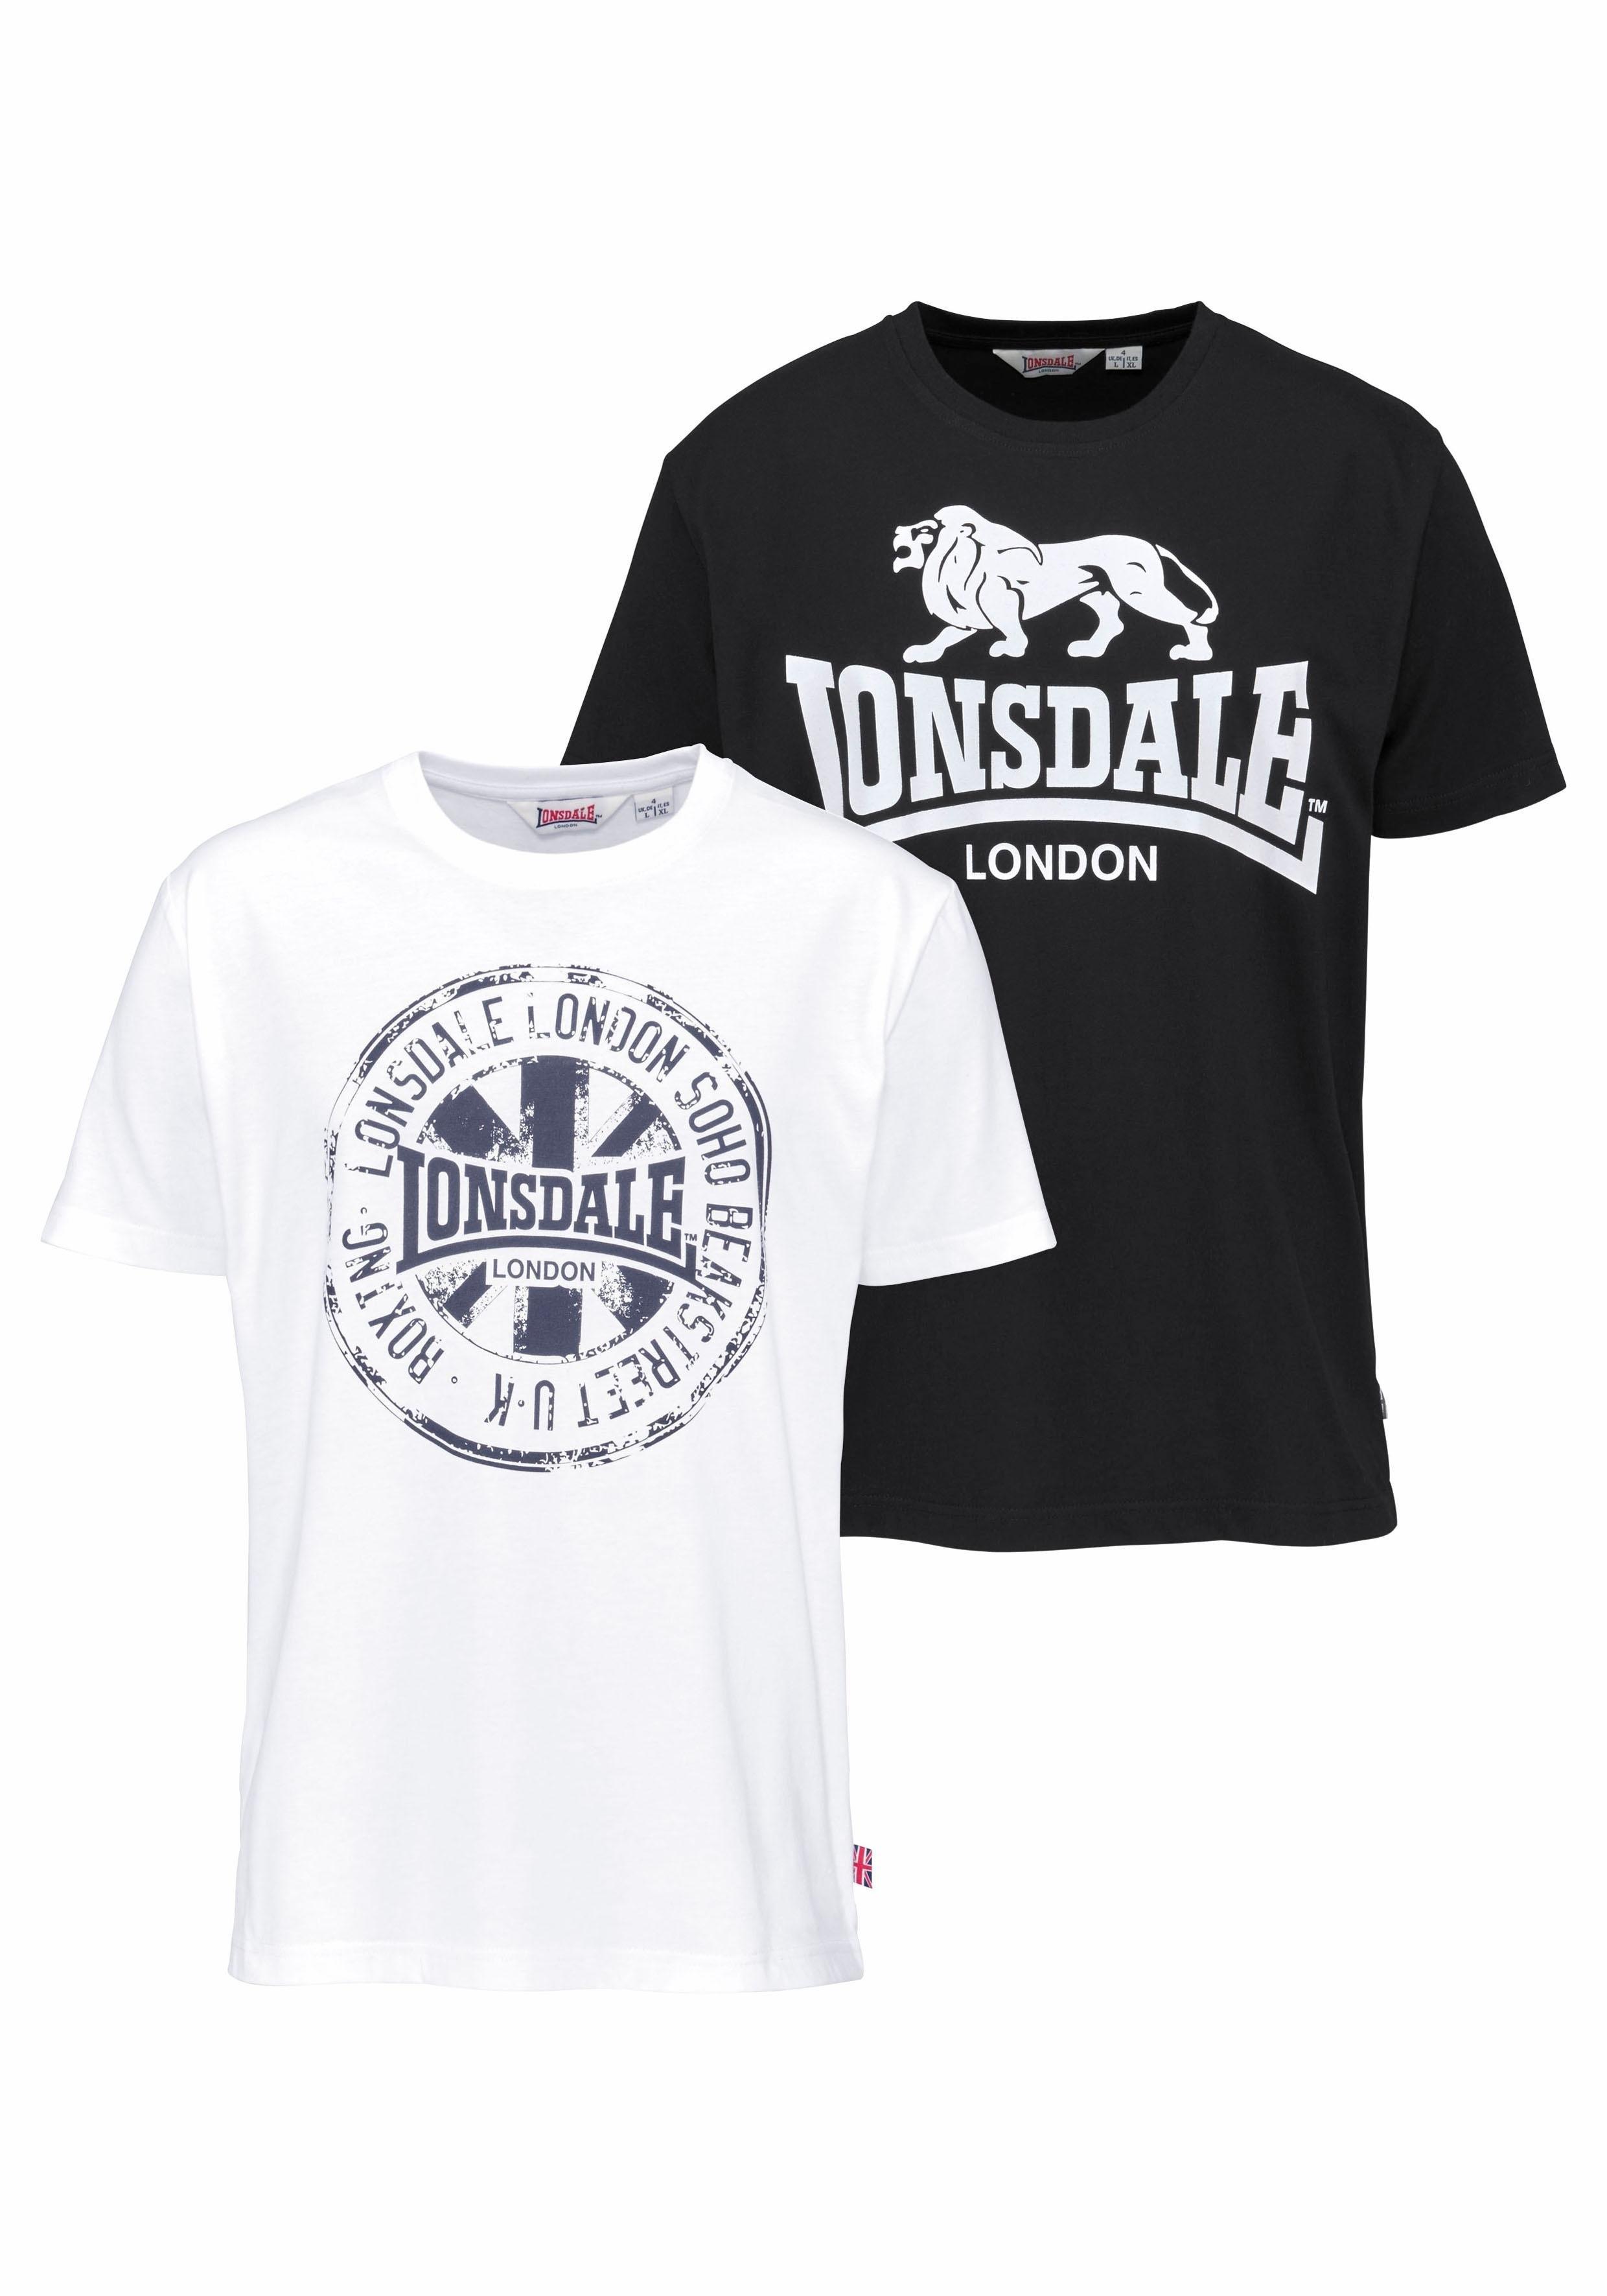 Lonsdale T-shirt DILDAWN (set, 2-delig, Set van 2) - verschillende betaalmethodes